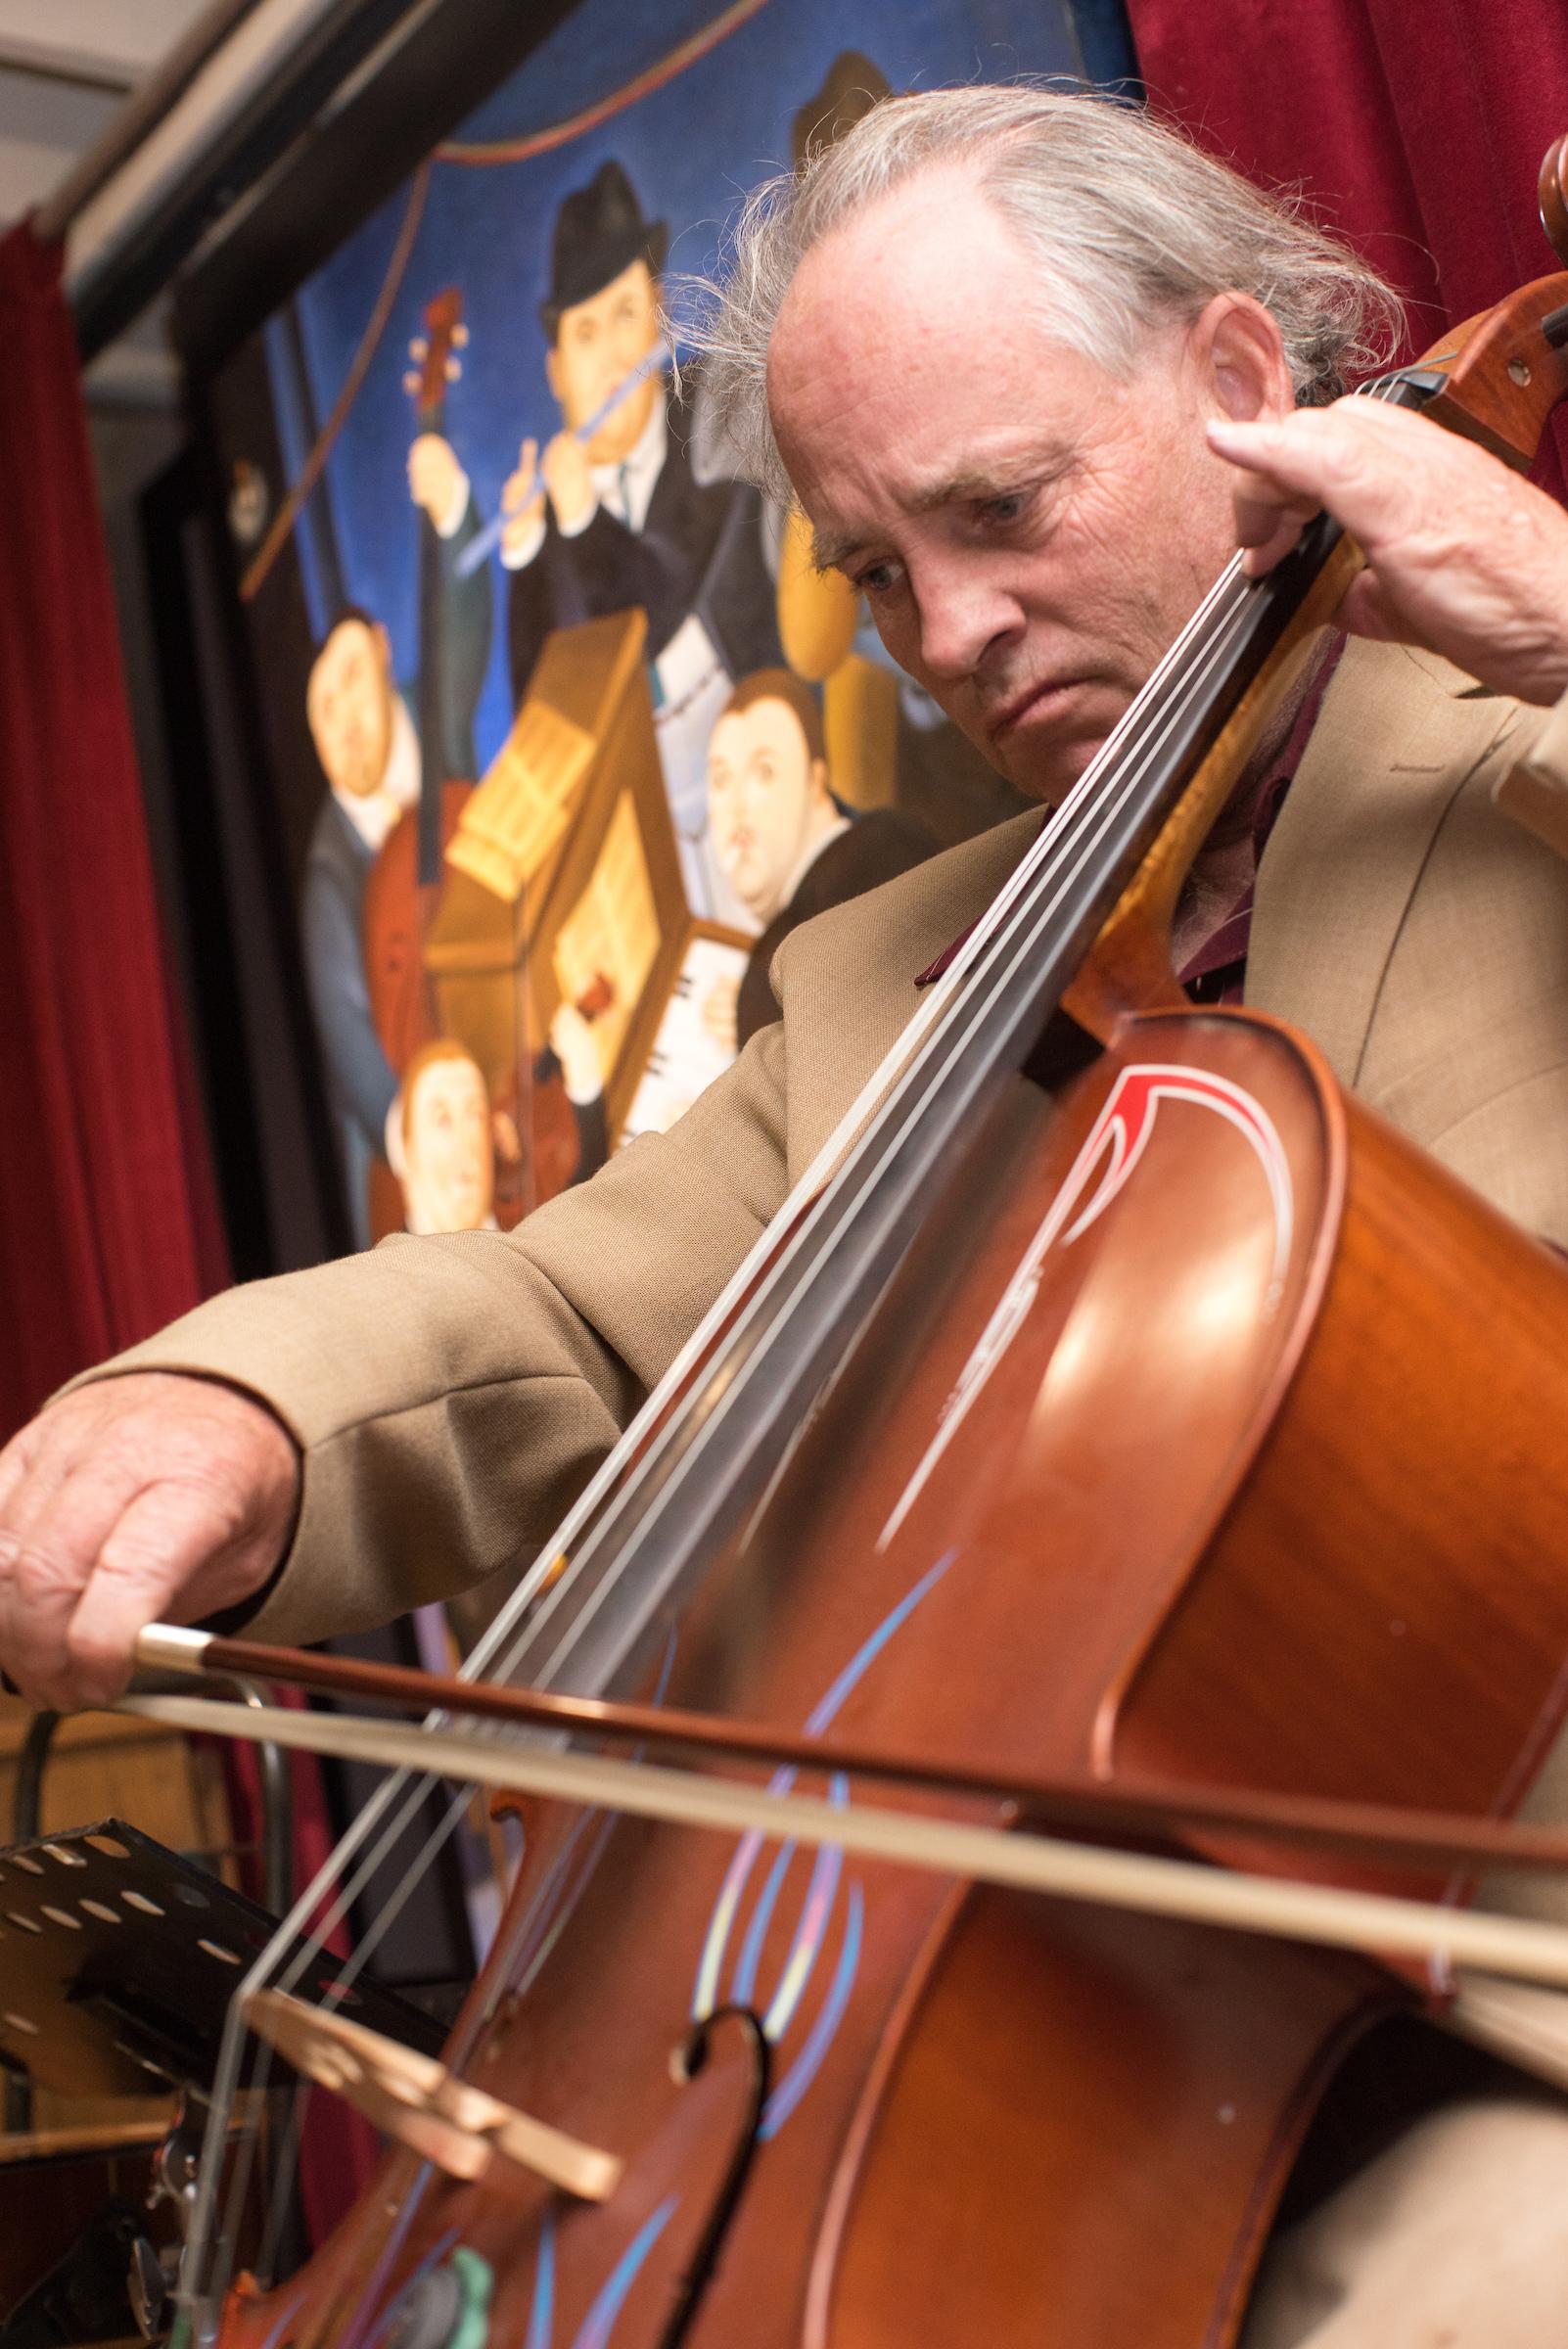 JJ-Cello-John